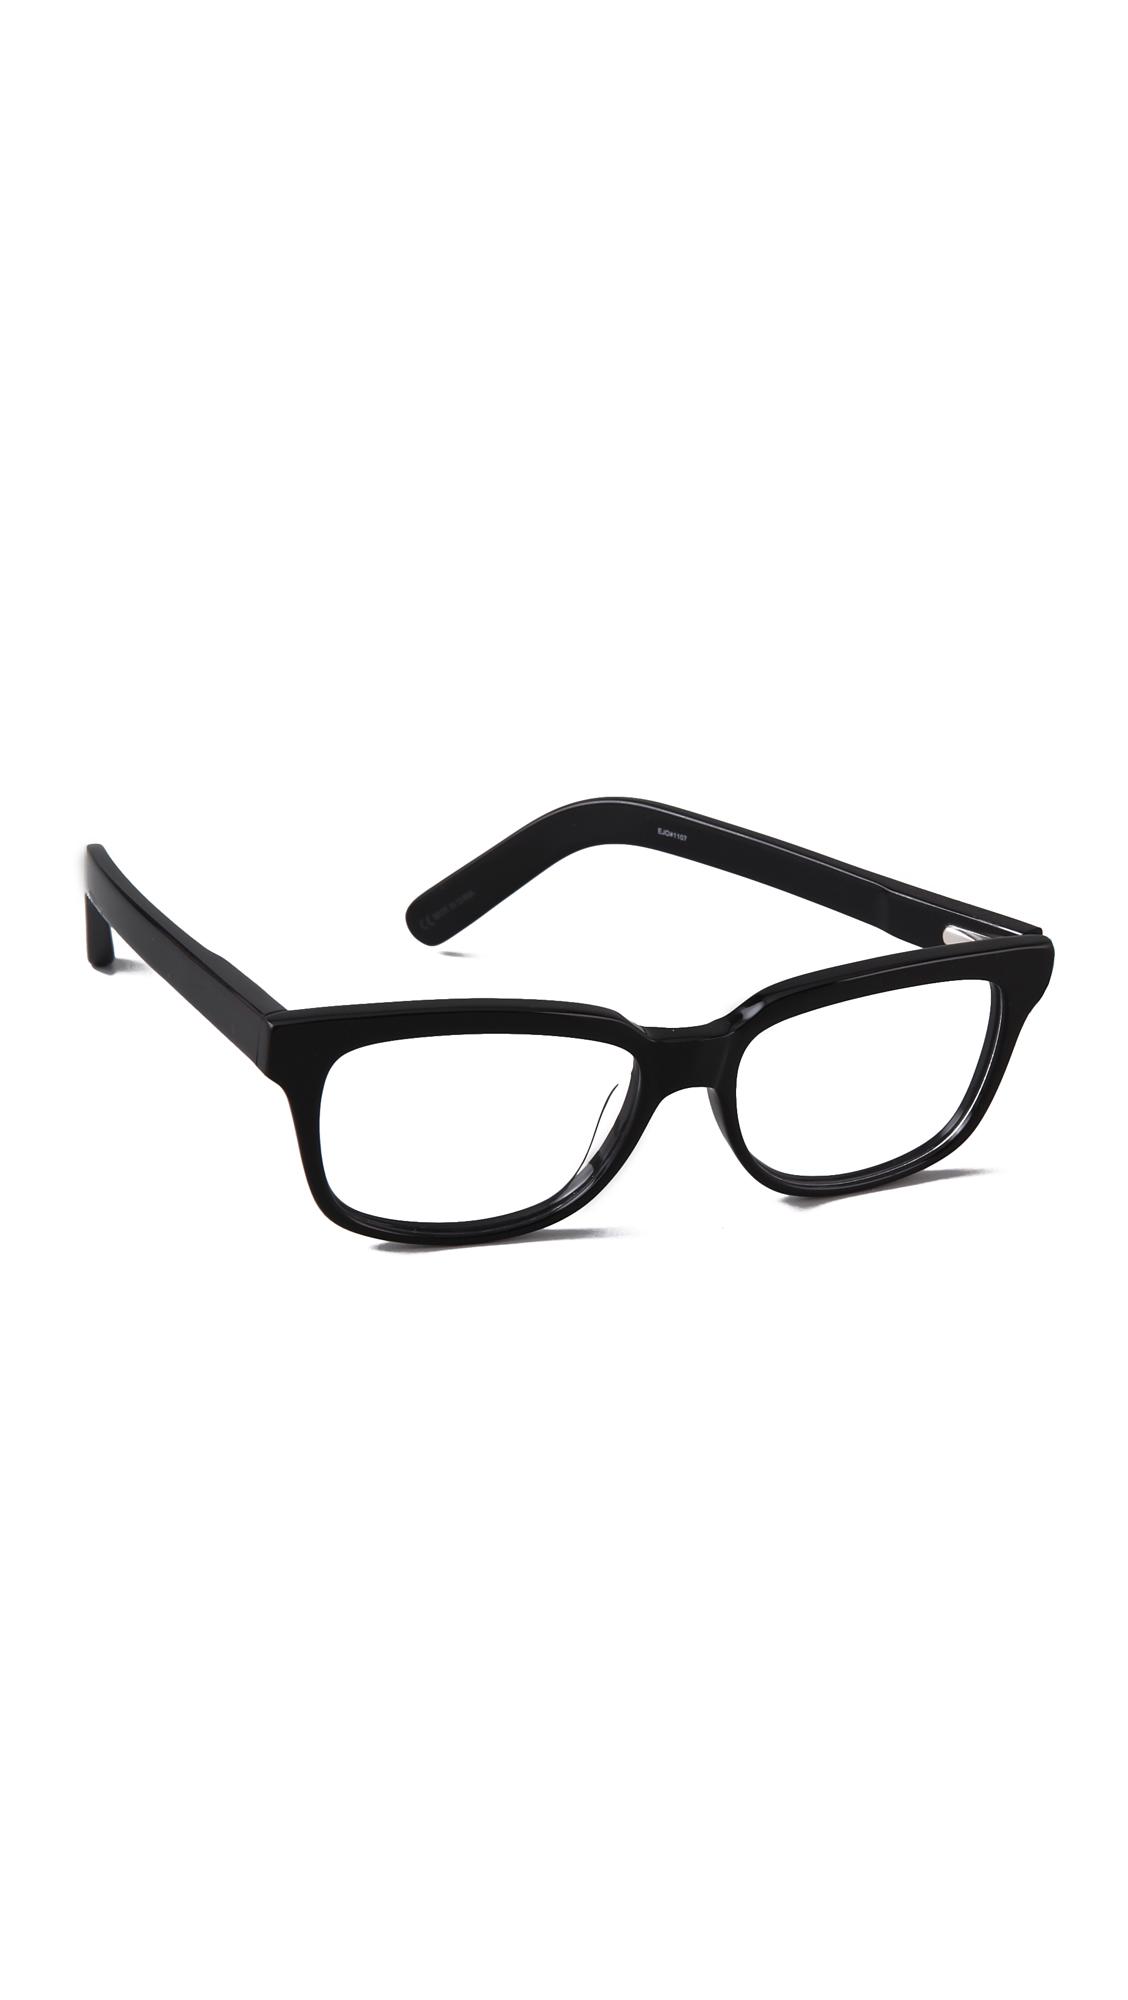 e317a32f4614e Elizabeth and James Reade Glasses on PopScreen